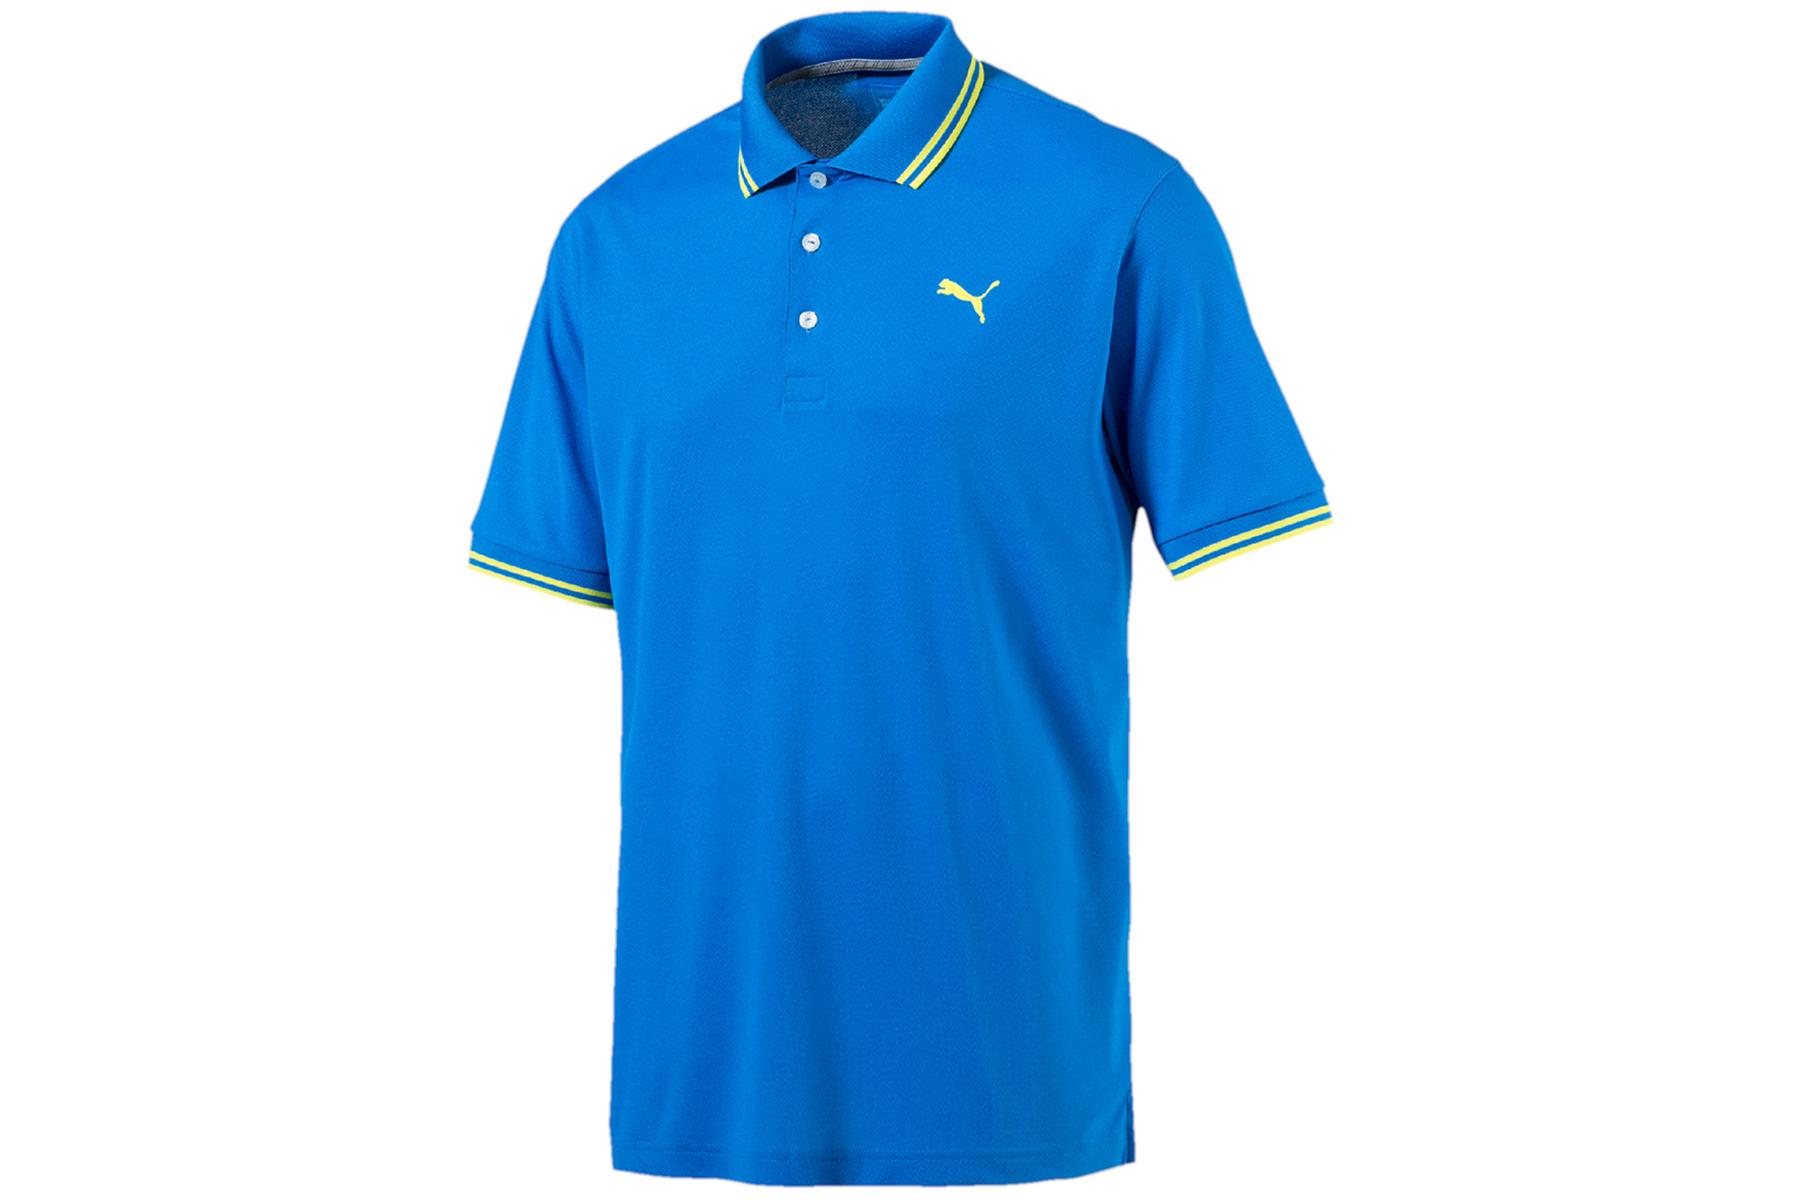 Puma Golf Pounce Pique Polo Shirt From American Golf